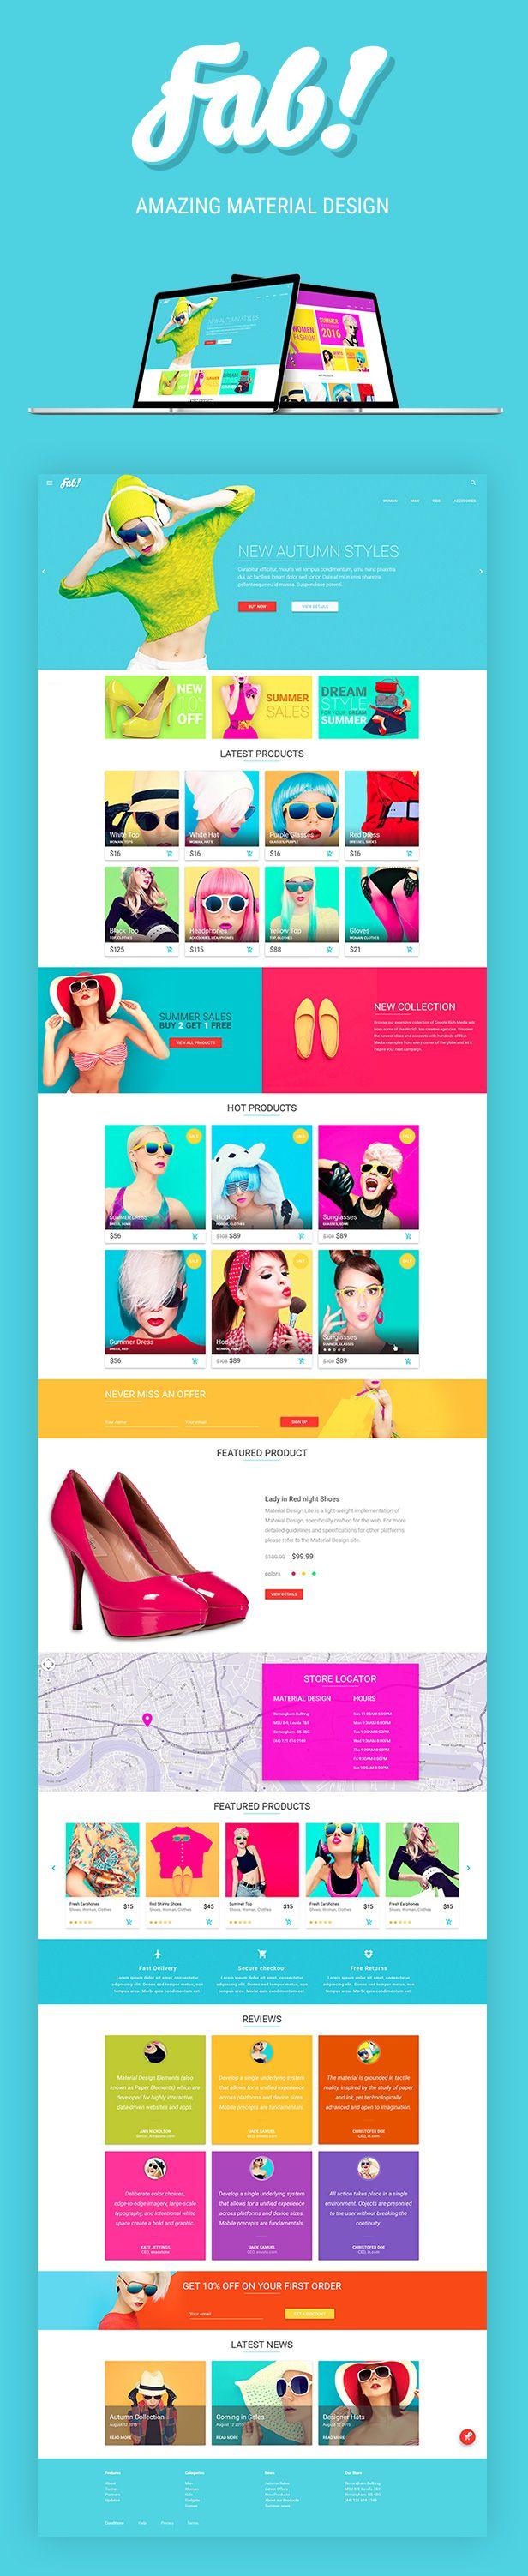 16 best Parallax images on Pinterest | Website designs, Design web ...